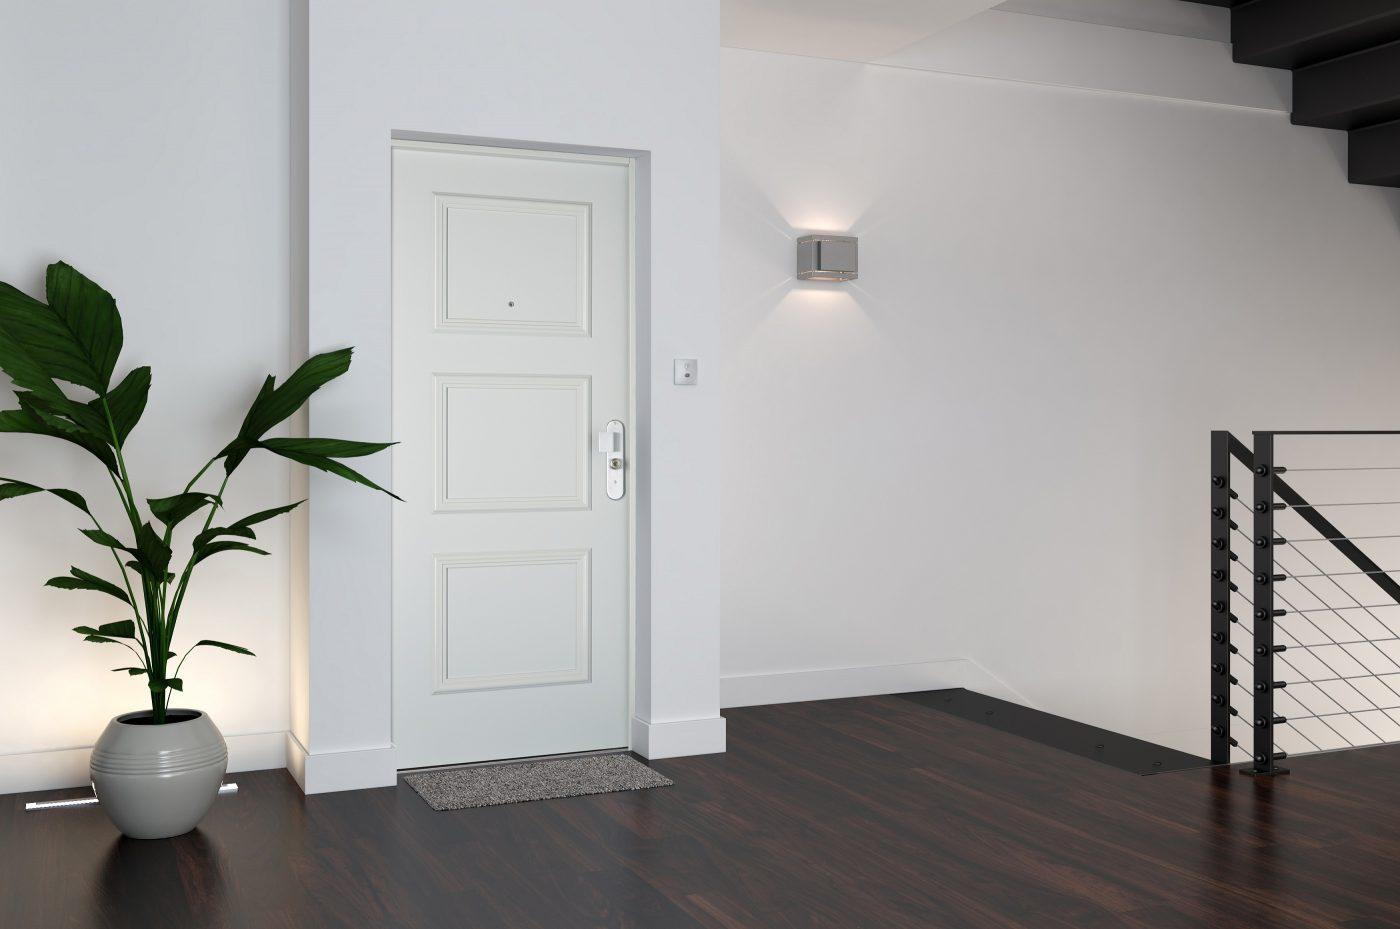 puertas acorazadas fichet vivienda 2